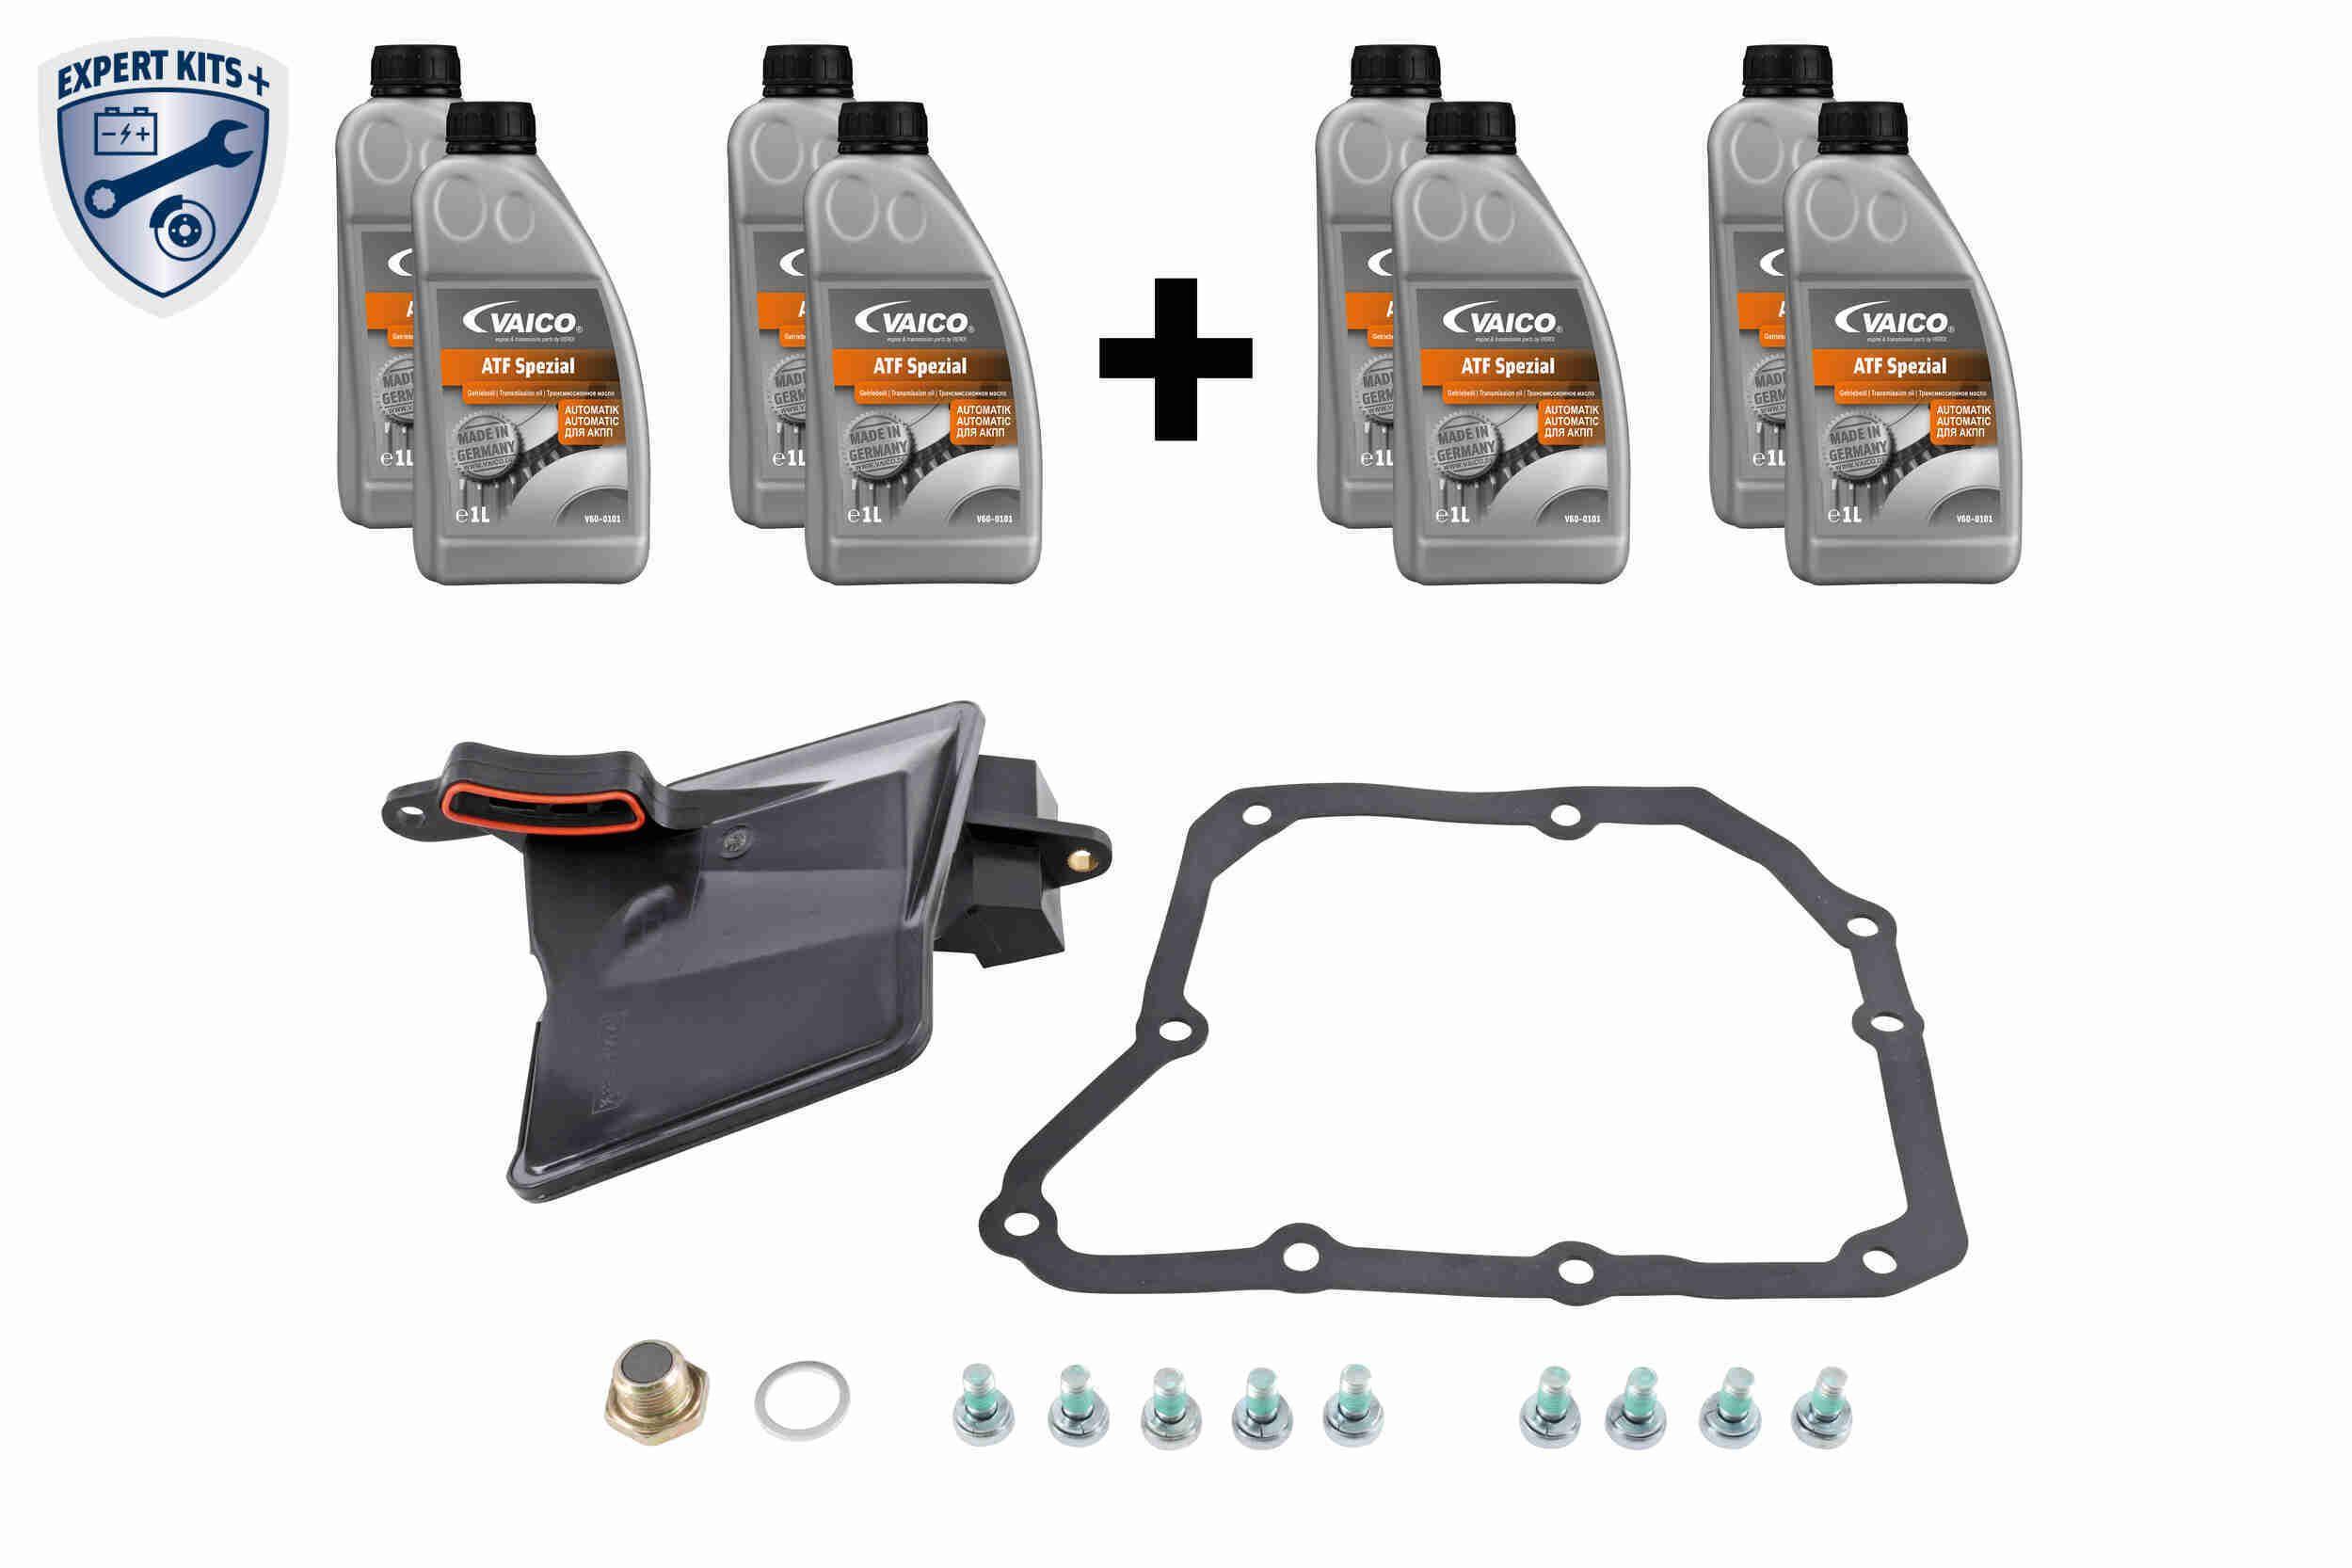 OPEL CORSA Teilesatz, Ölwechsel-Automatikgetriebe - Original VAICO V40-1604-XXL